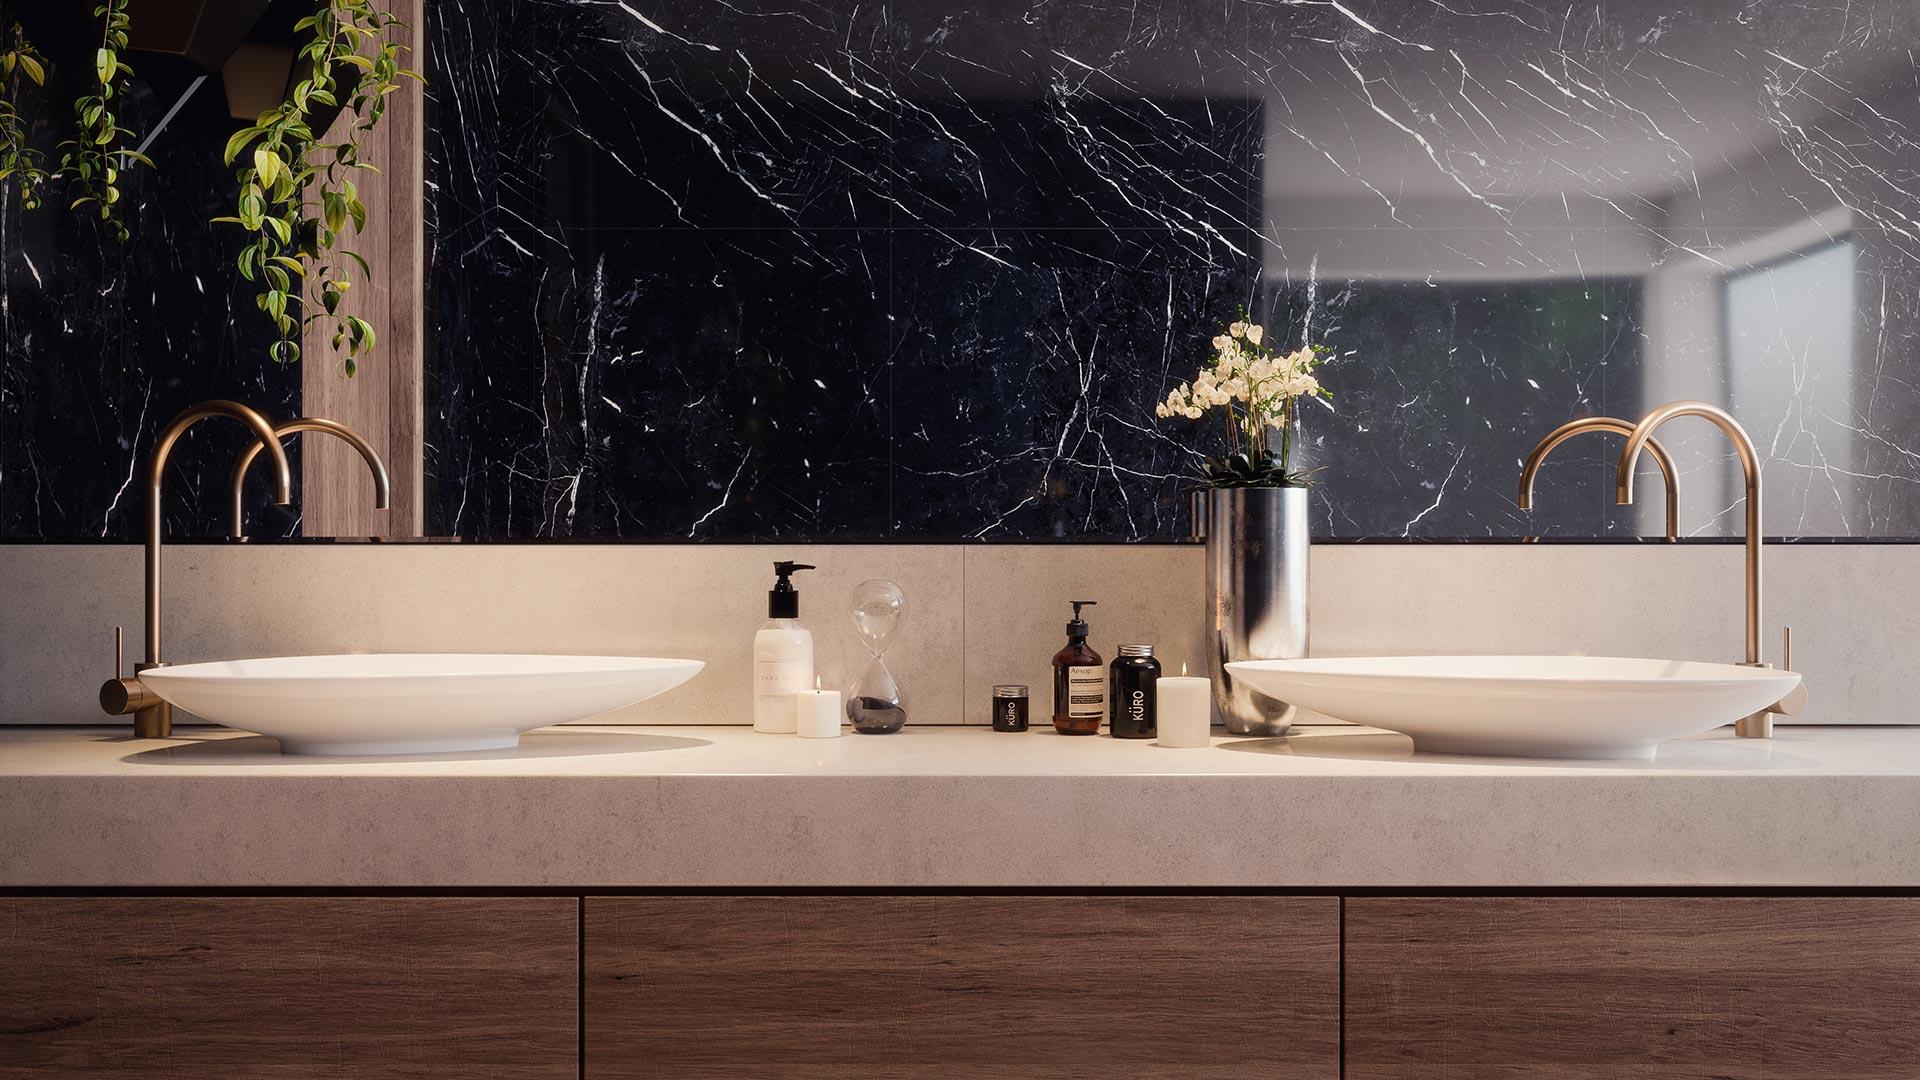 ScreenAge 3D Architectural Visualisation Bathroom